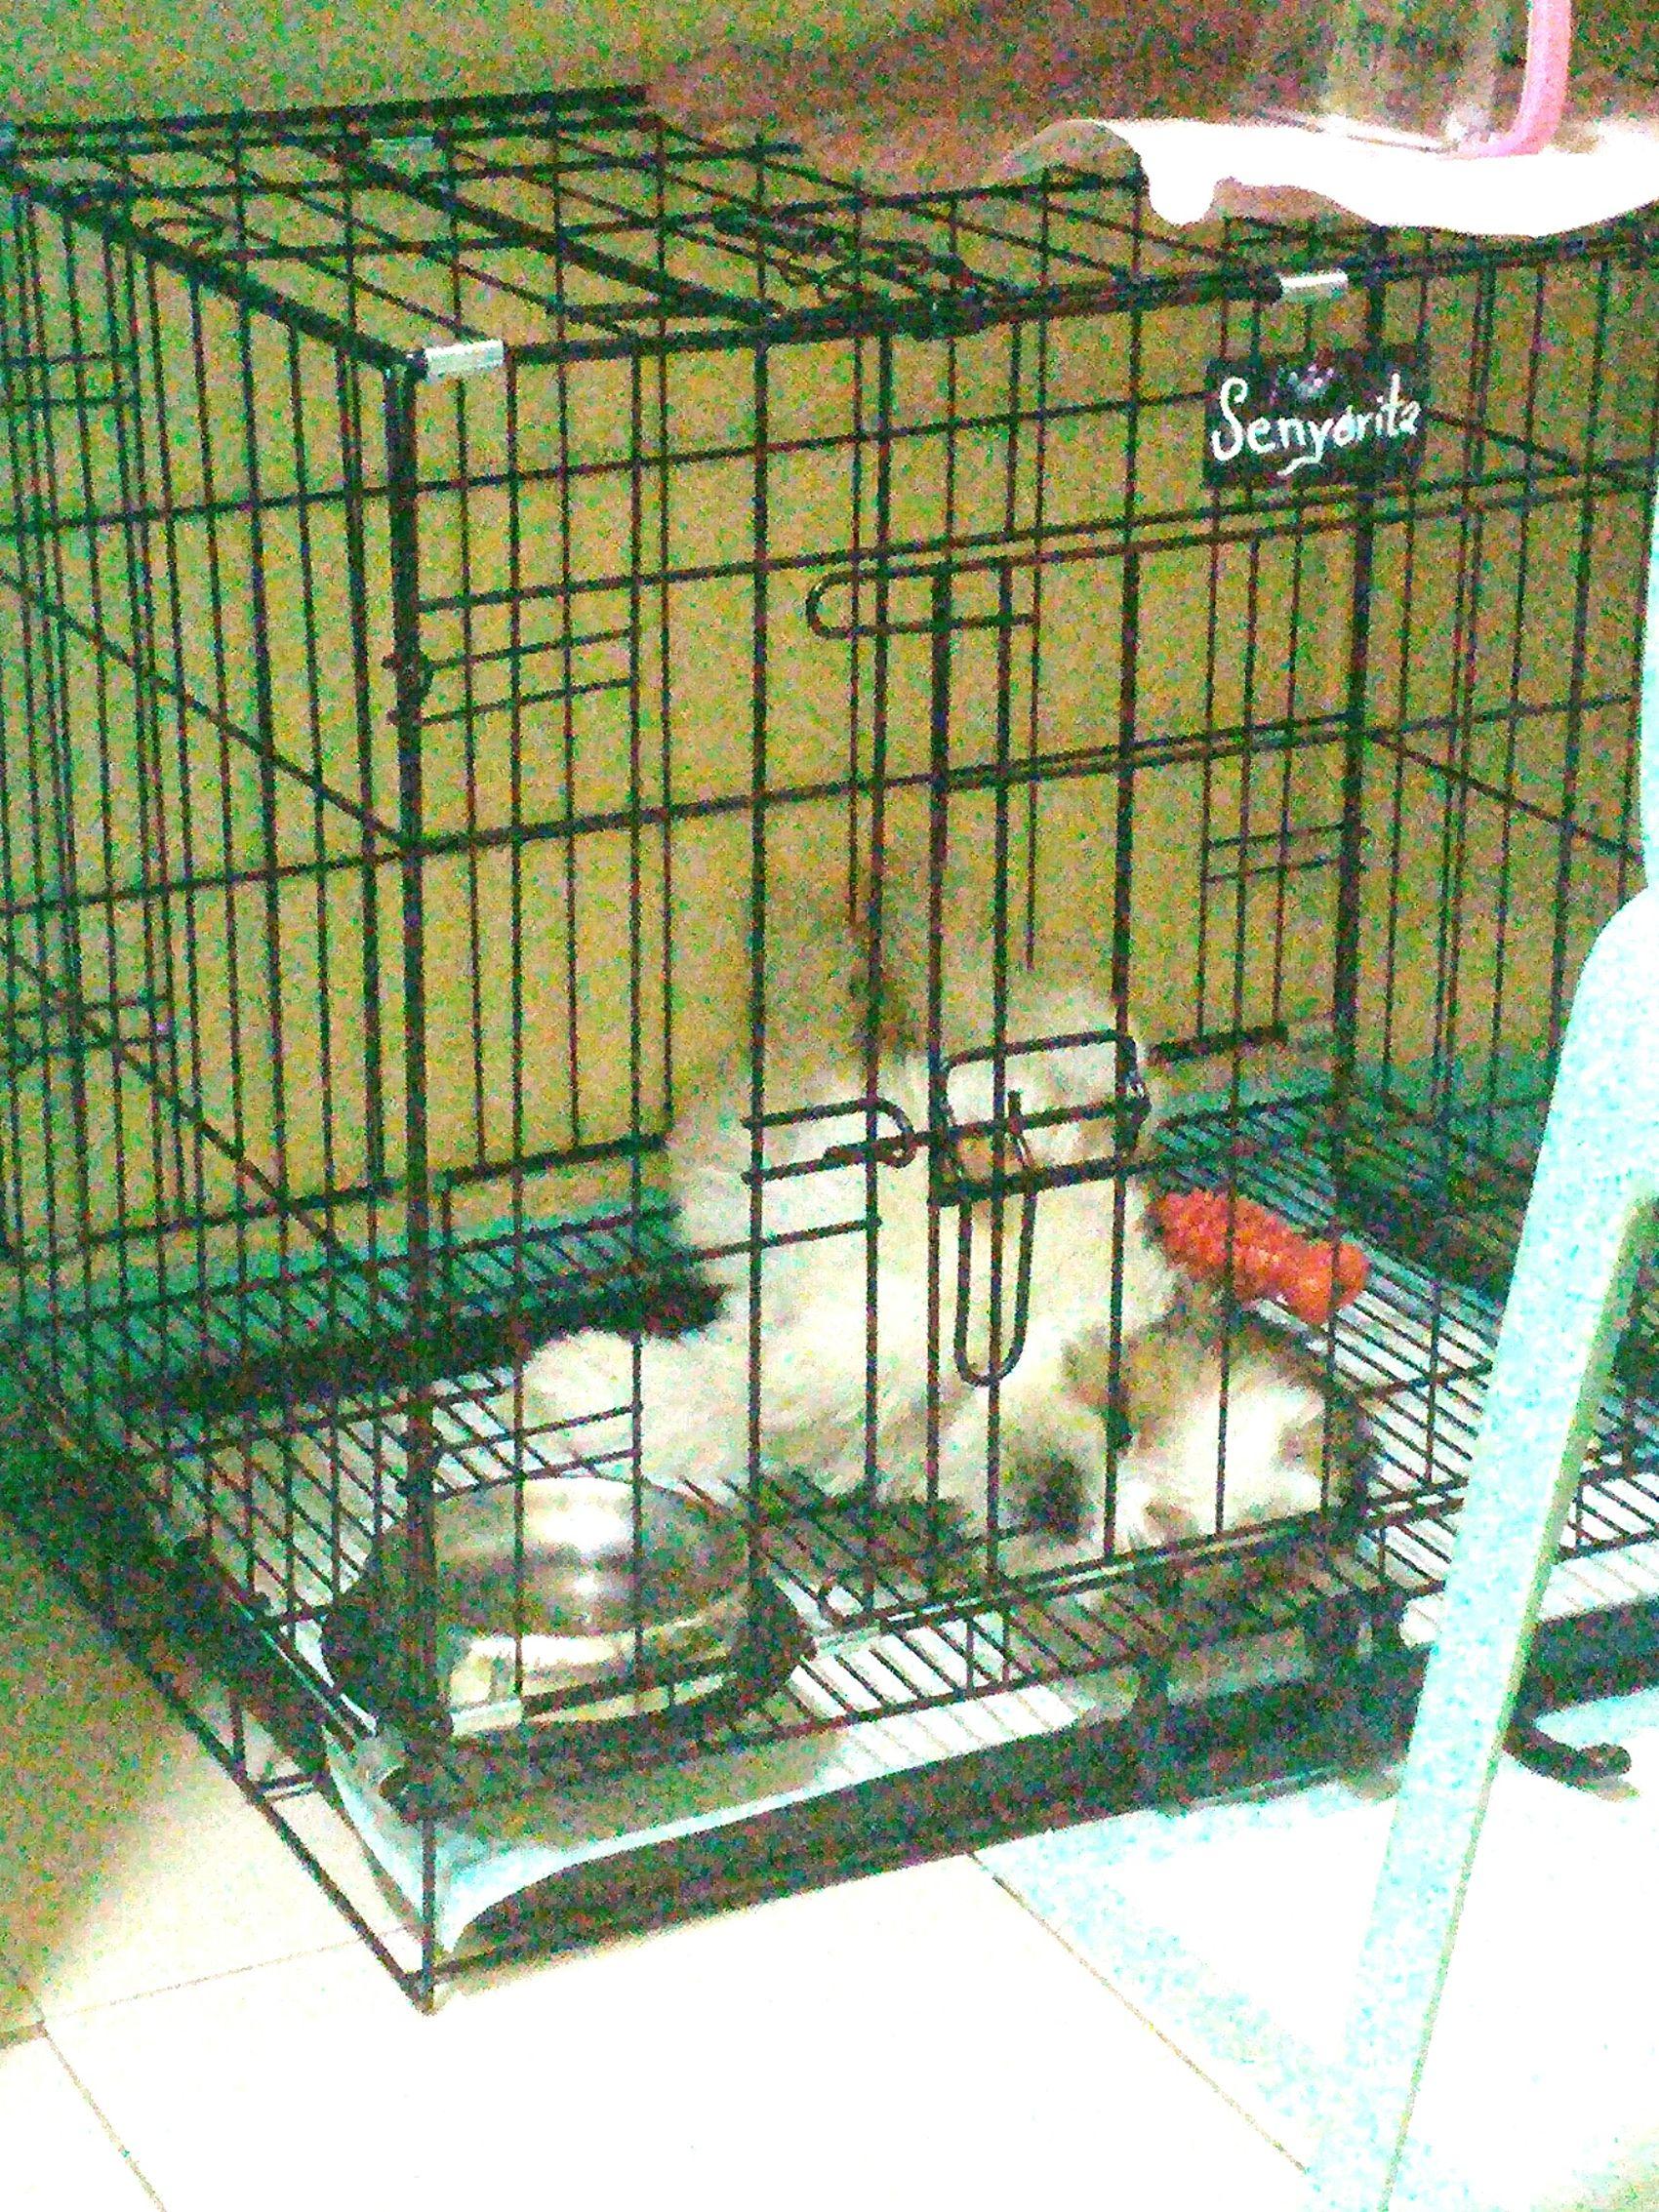 Good night everyone! Senyorita Senyoritatheshihtzu Shihtzu My Little Puppy